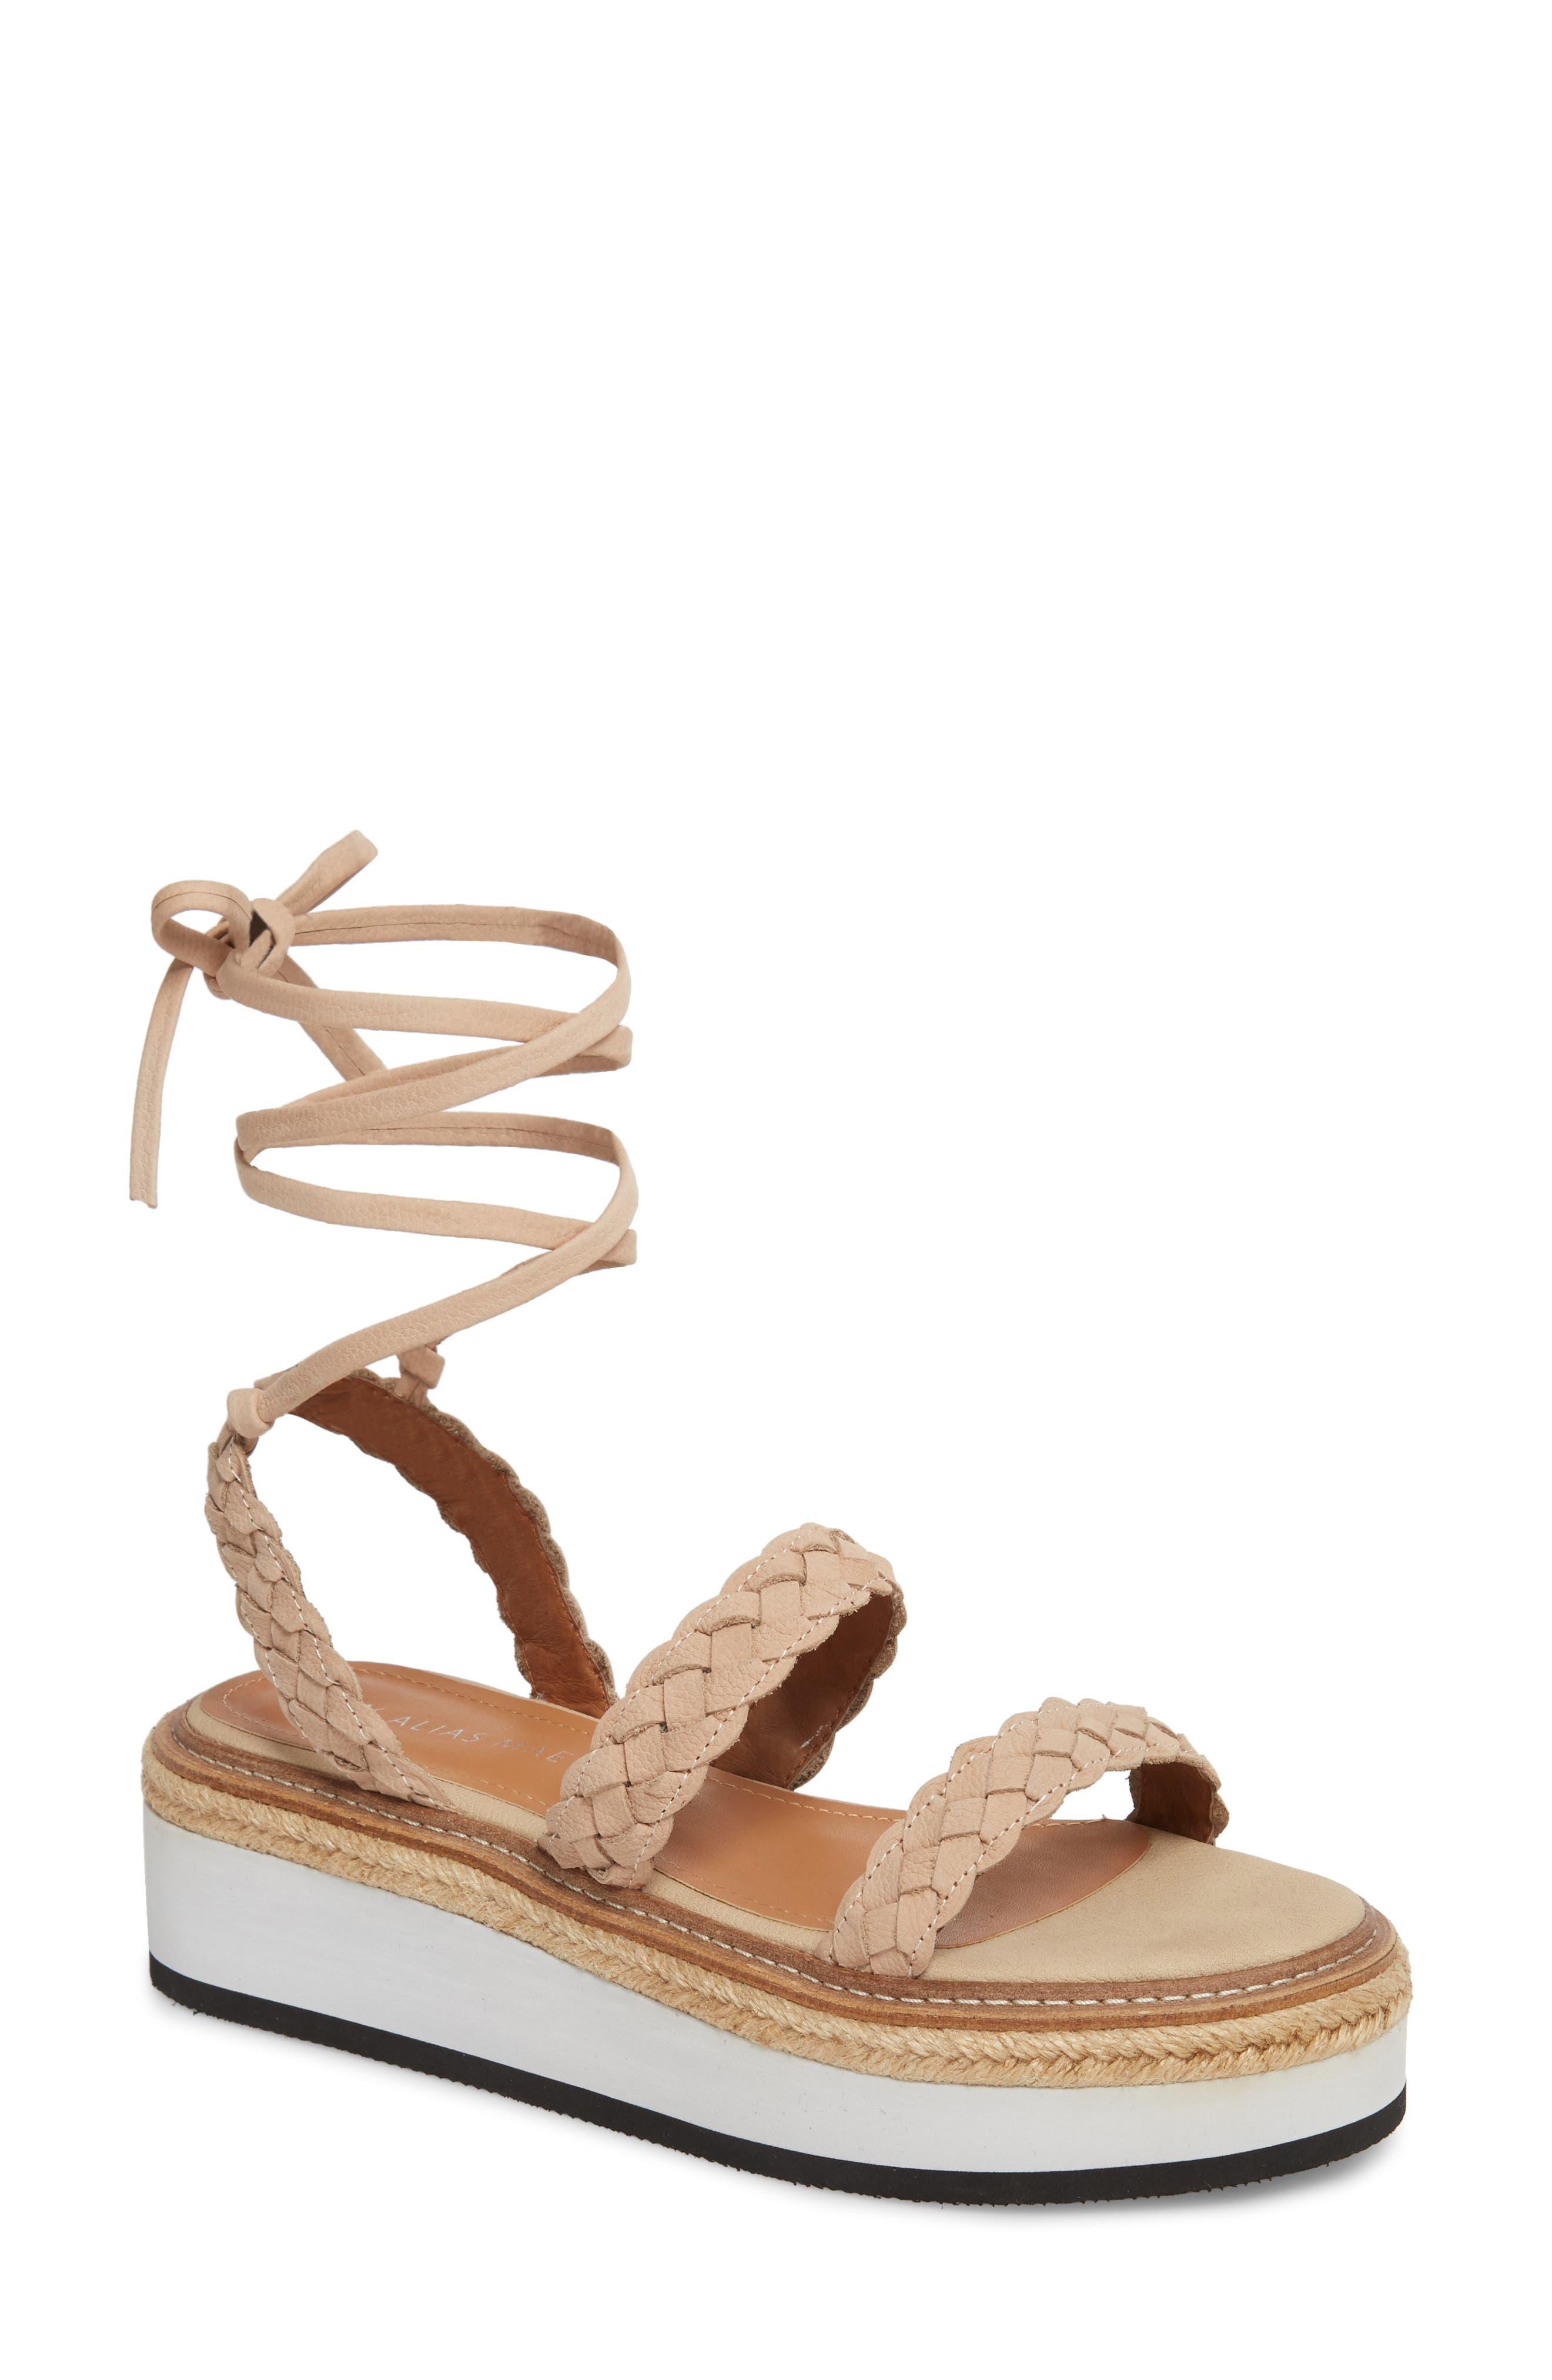 Nieve Braided Platform Sandal,                             Main thumbnail 1, color,                             Natural Leather